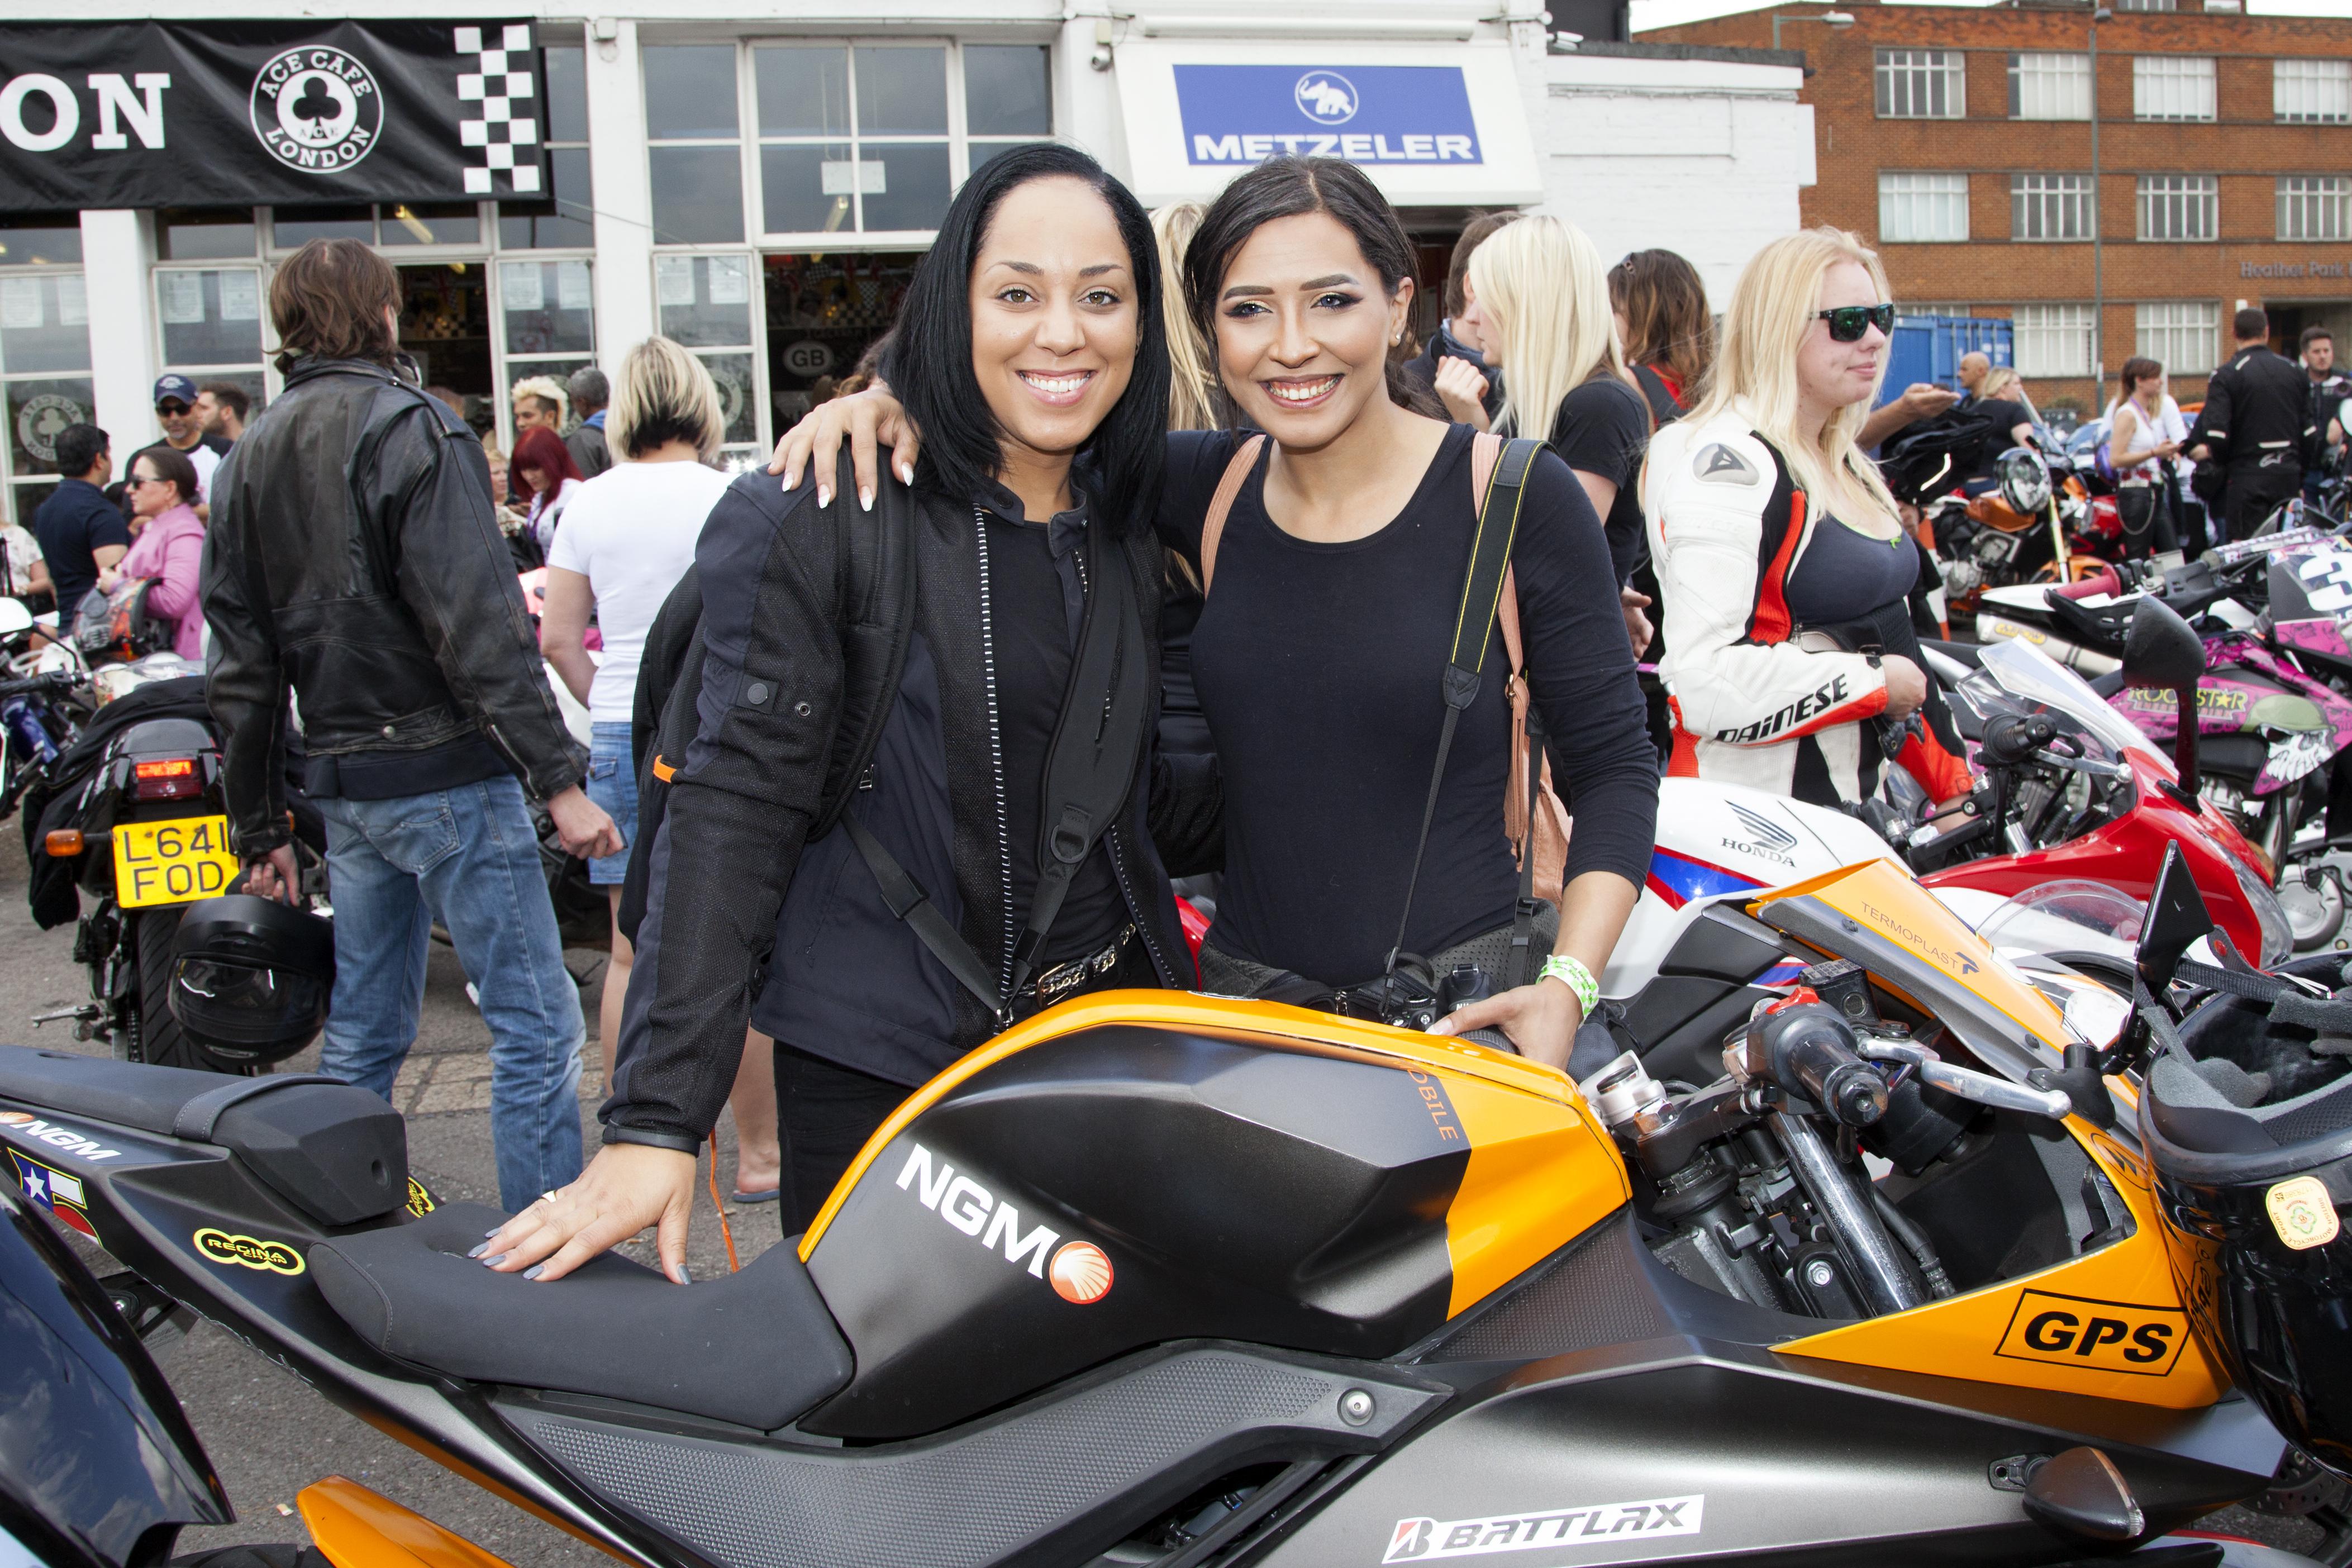 618 women set new bike meet record